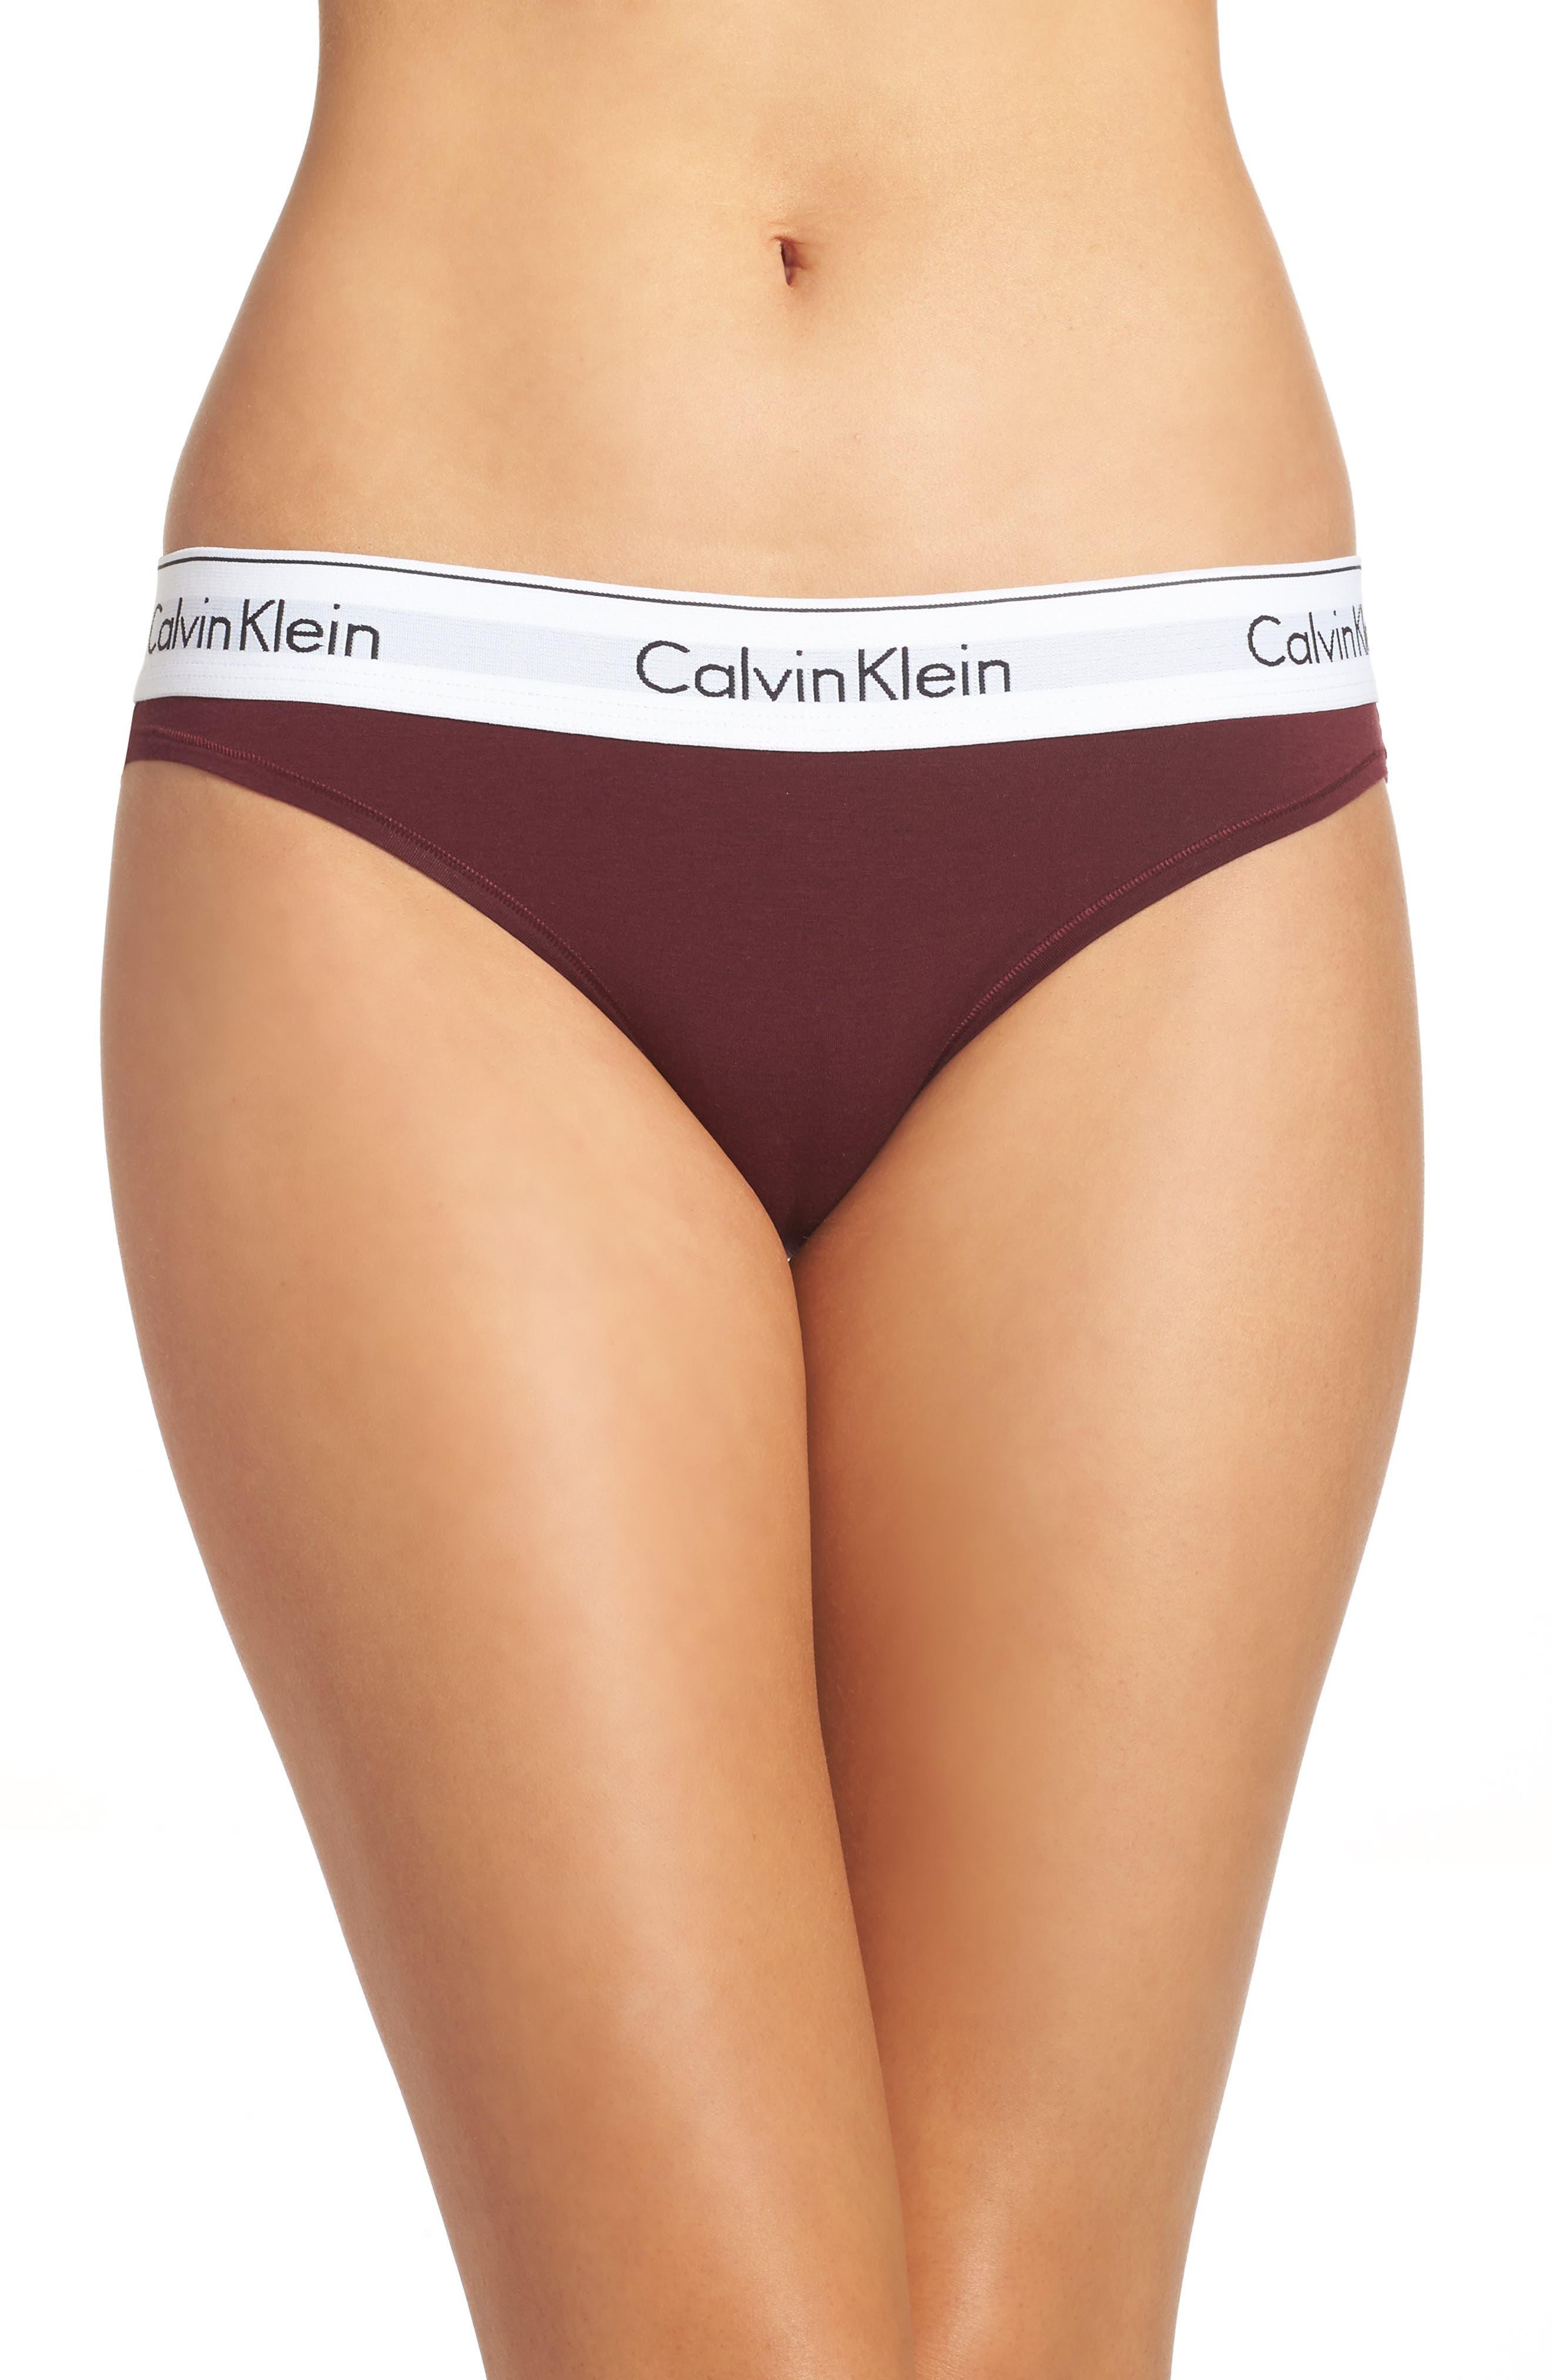 Alternate Image 1 Selected - Calvin Klein 'Modern Cotton Collection' Cotton Blend Bikini